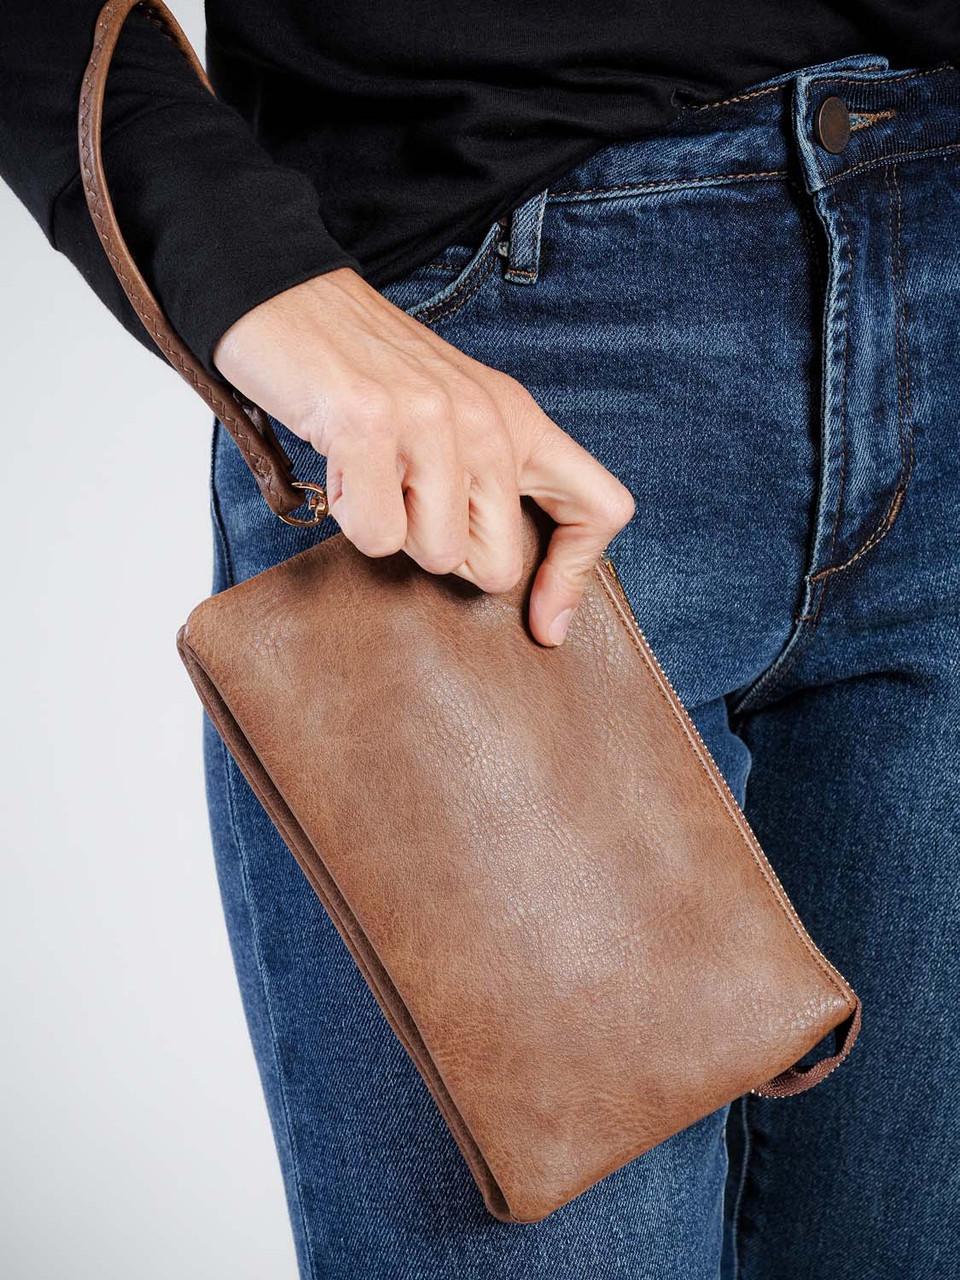 riley crossbody wristlet in chestnut jen and co